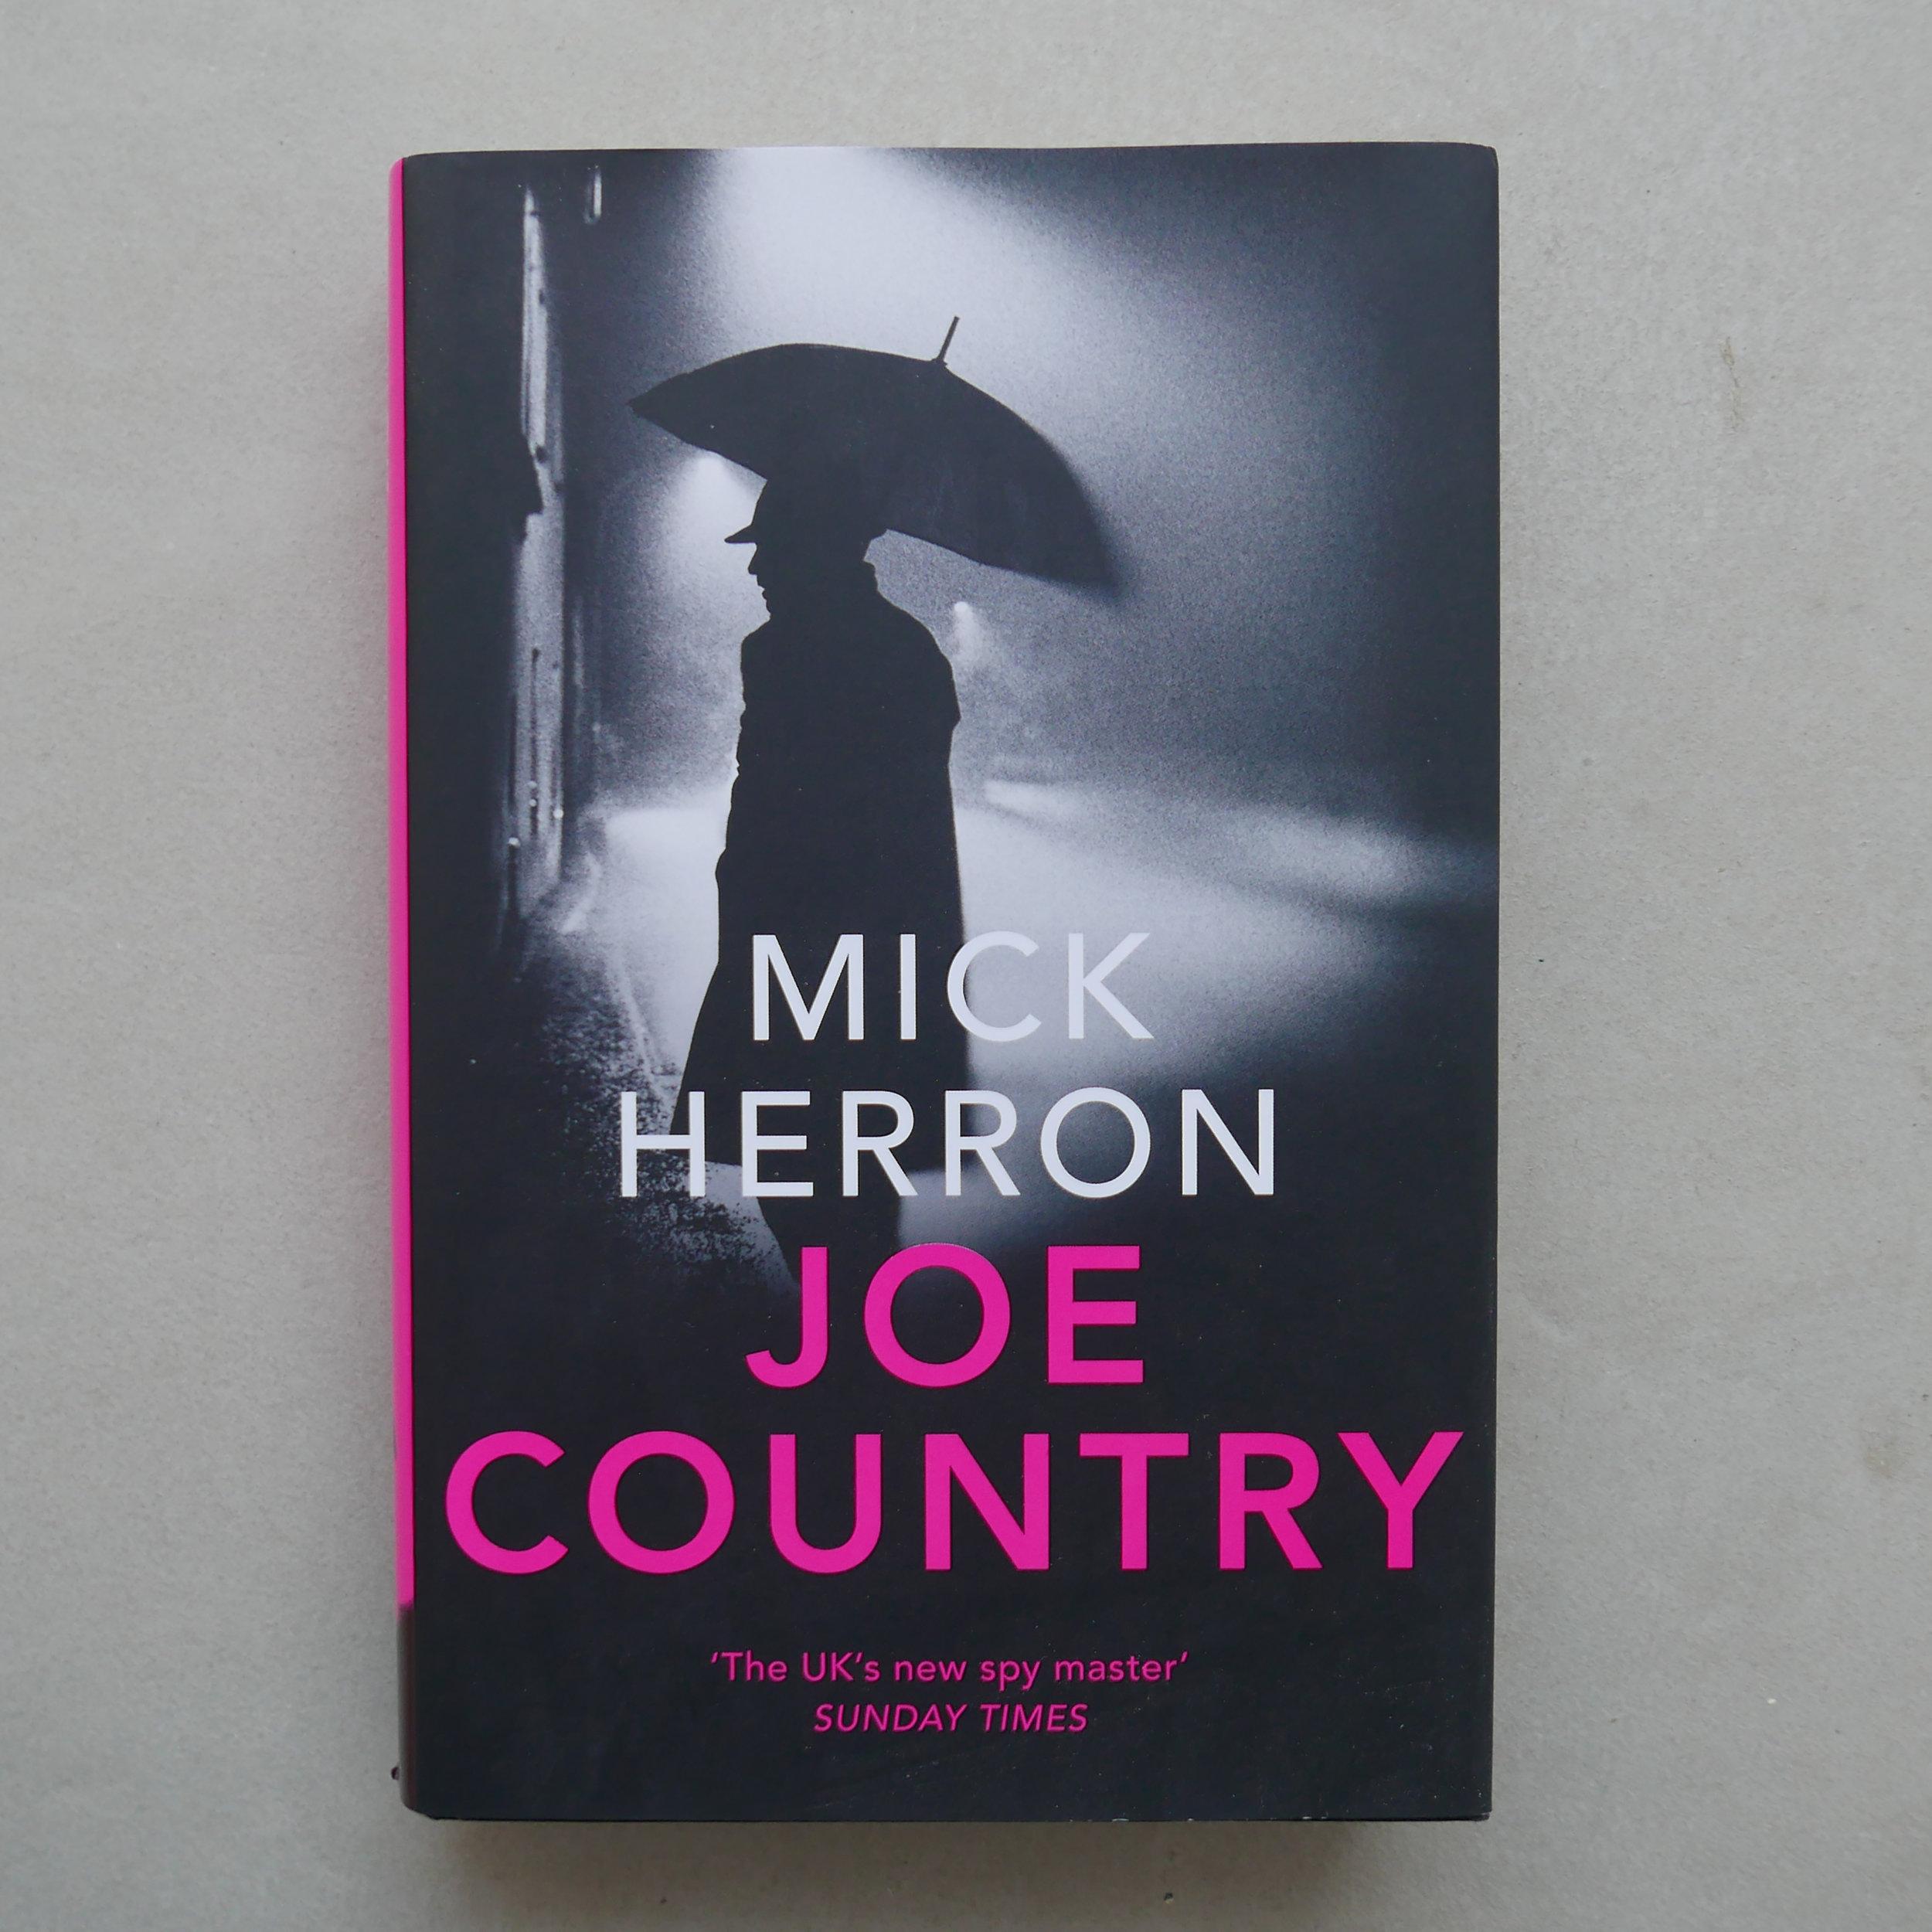 Joe Country - Mick Herron